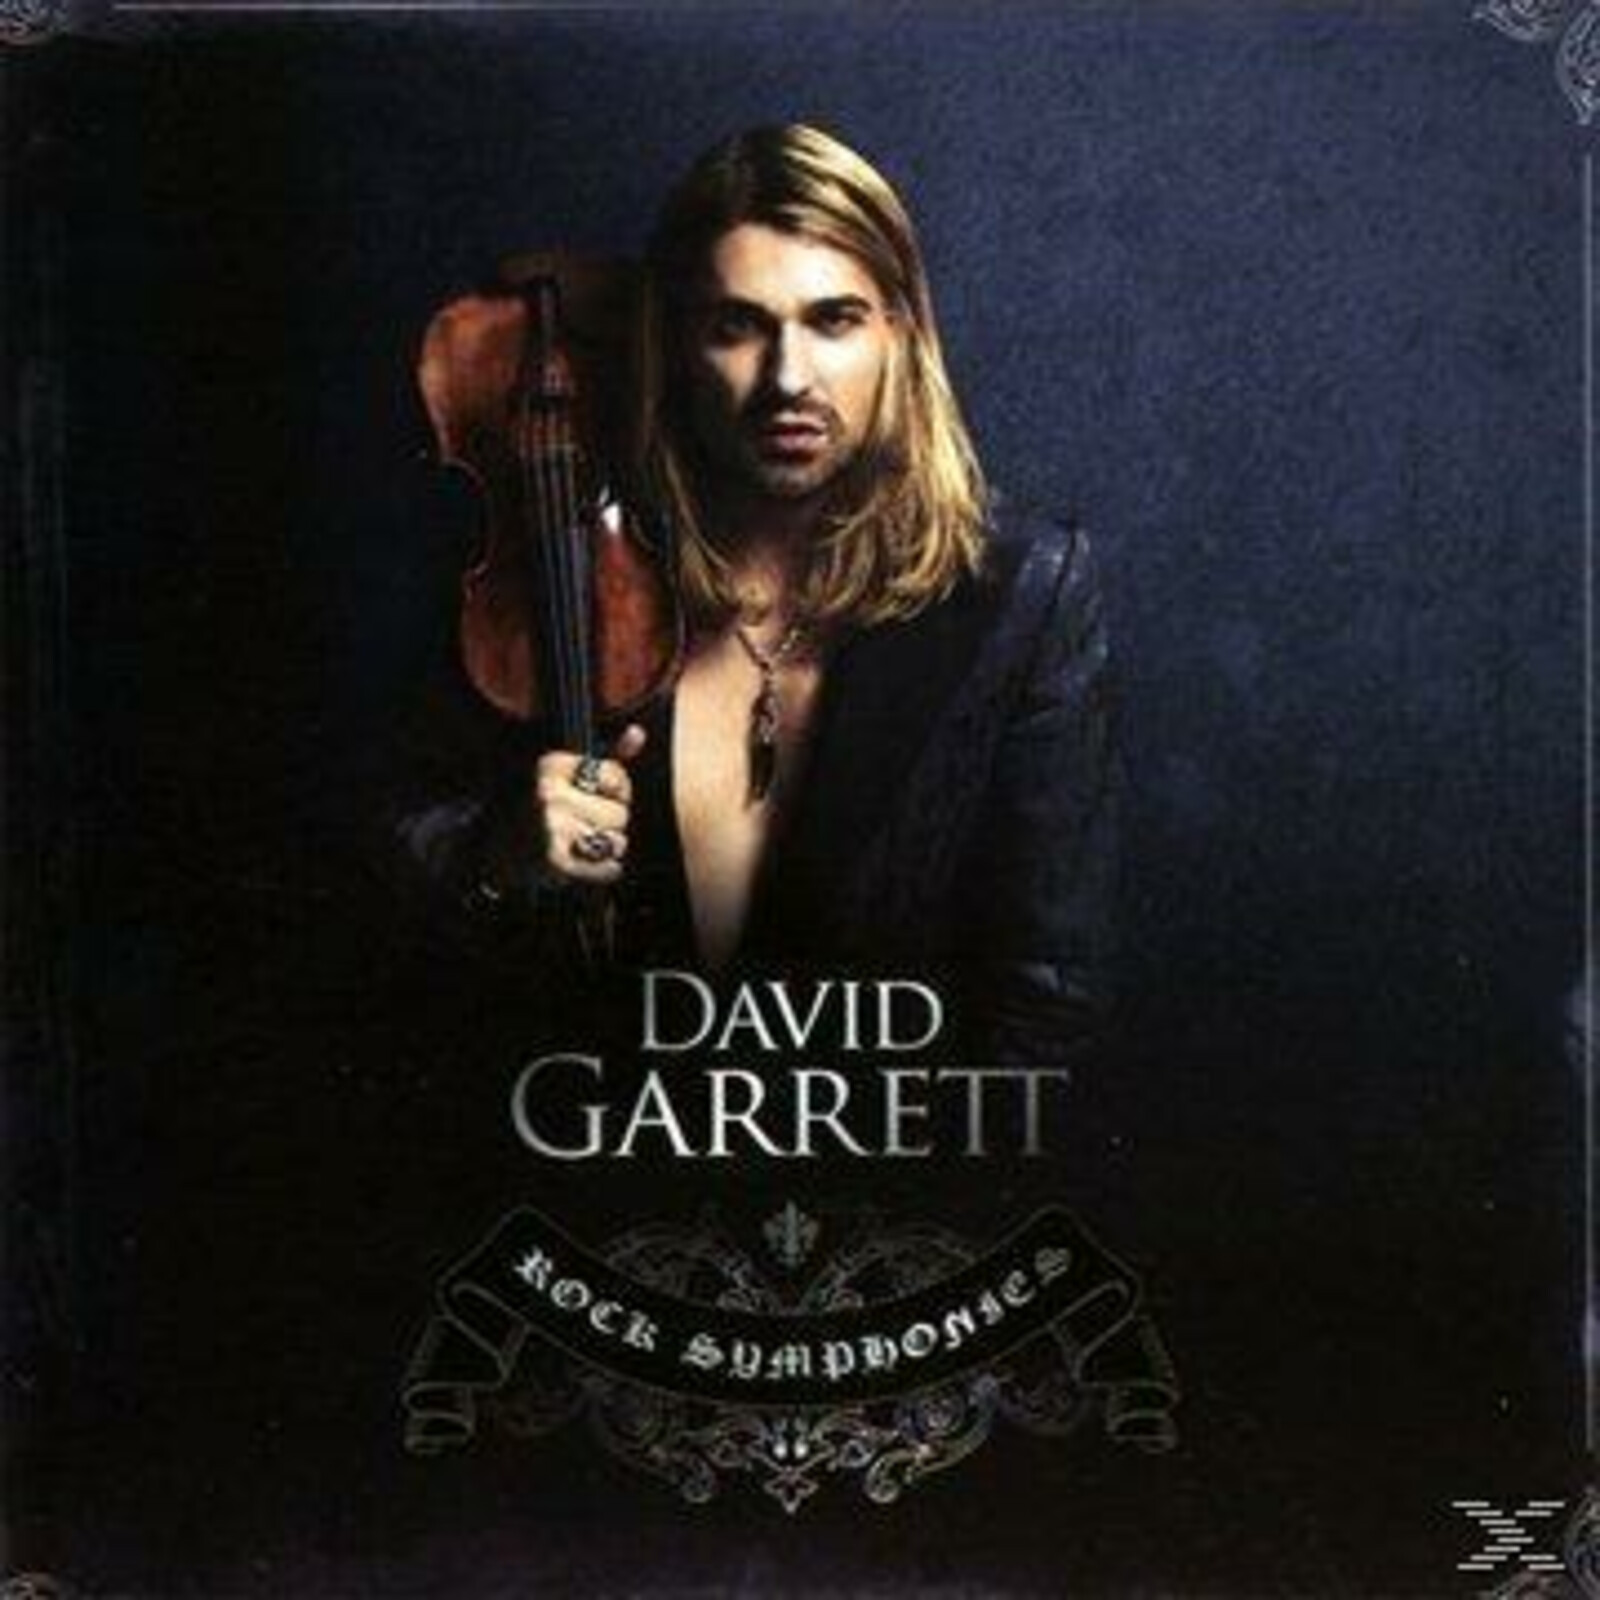 david garrett rock symphonies cd 28947826453 ebay. Black Bedroom Furniture Sets. Home Design Ideas